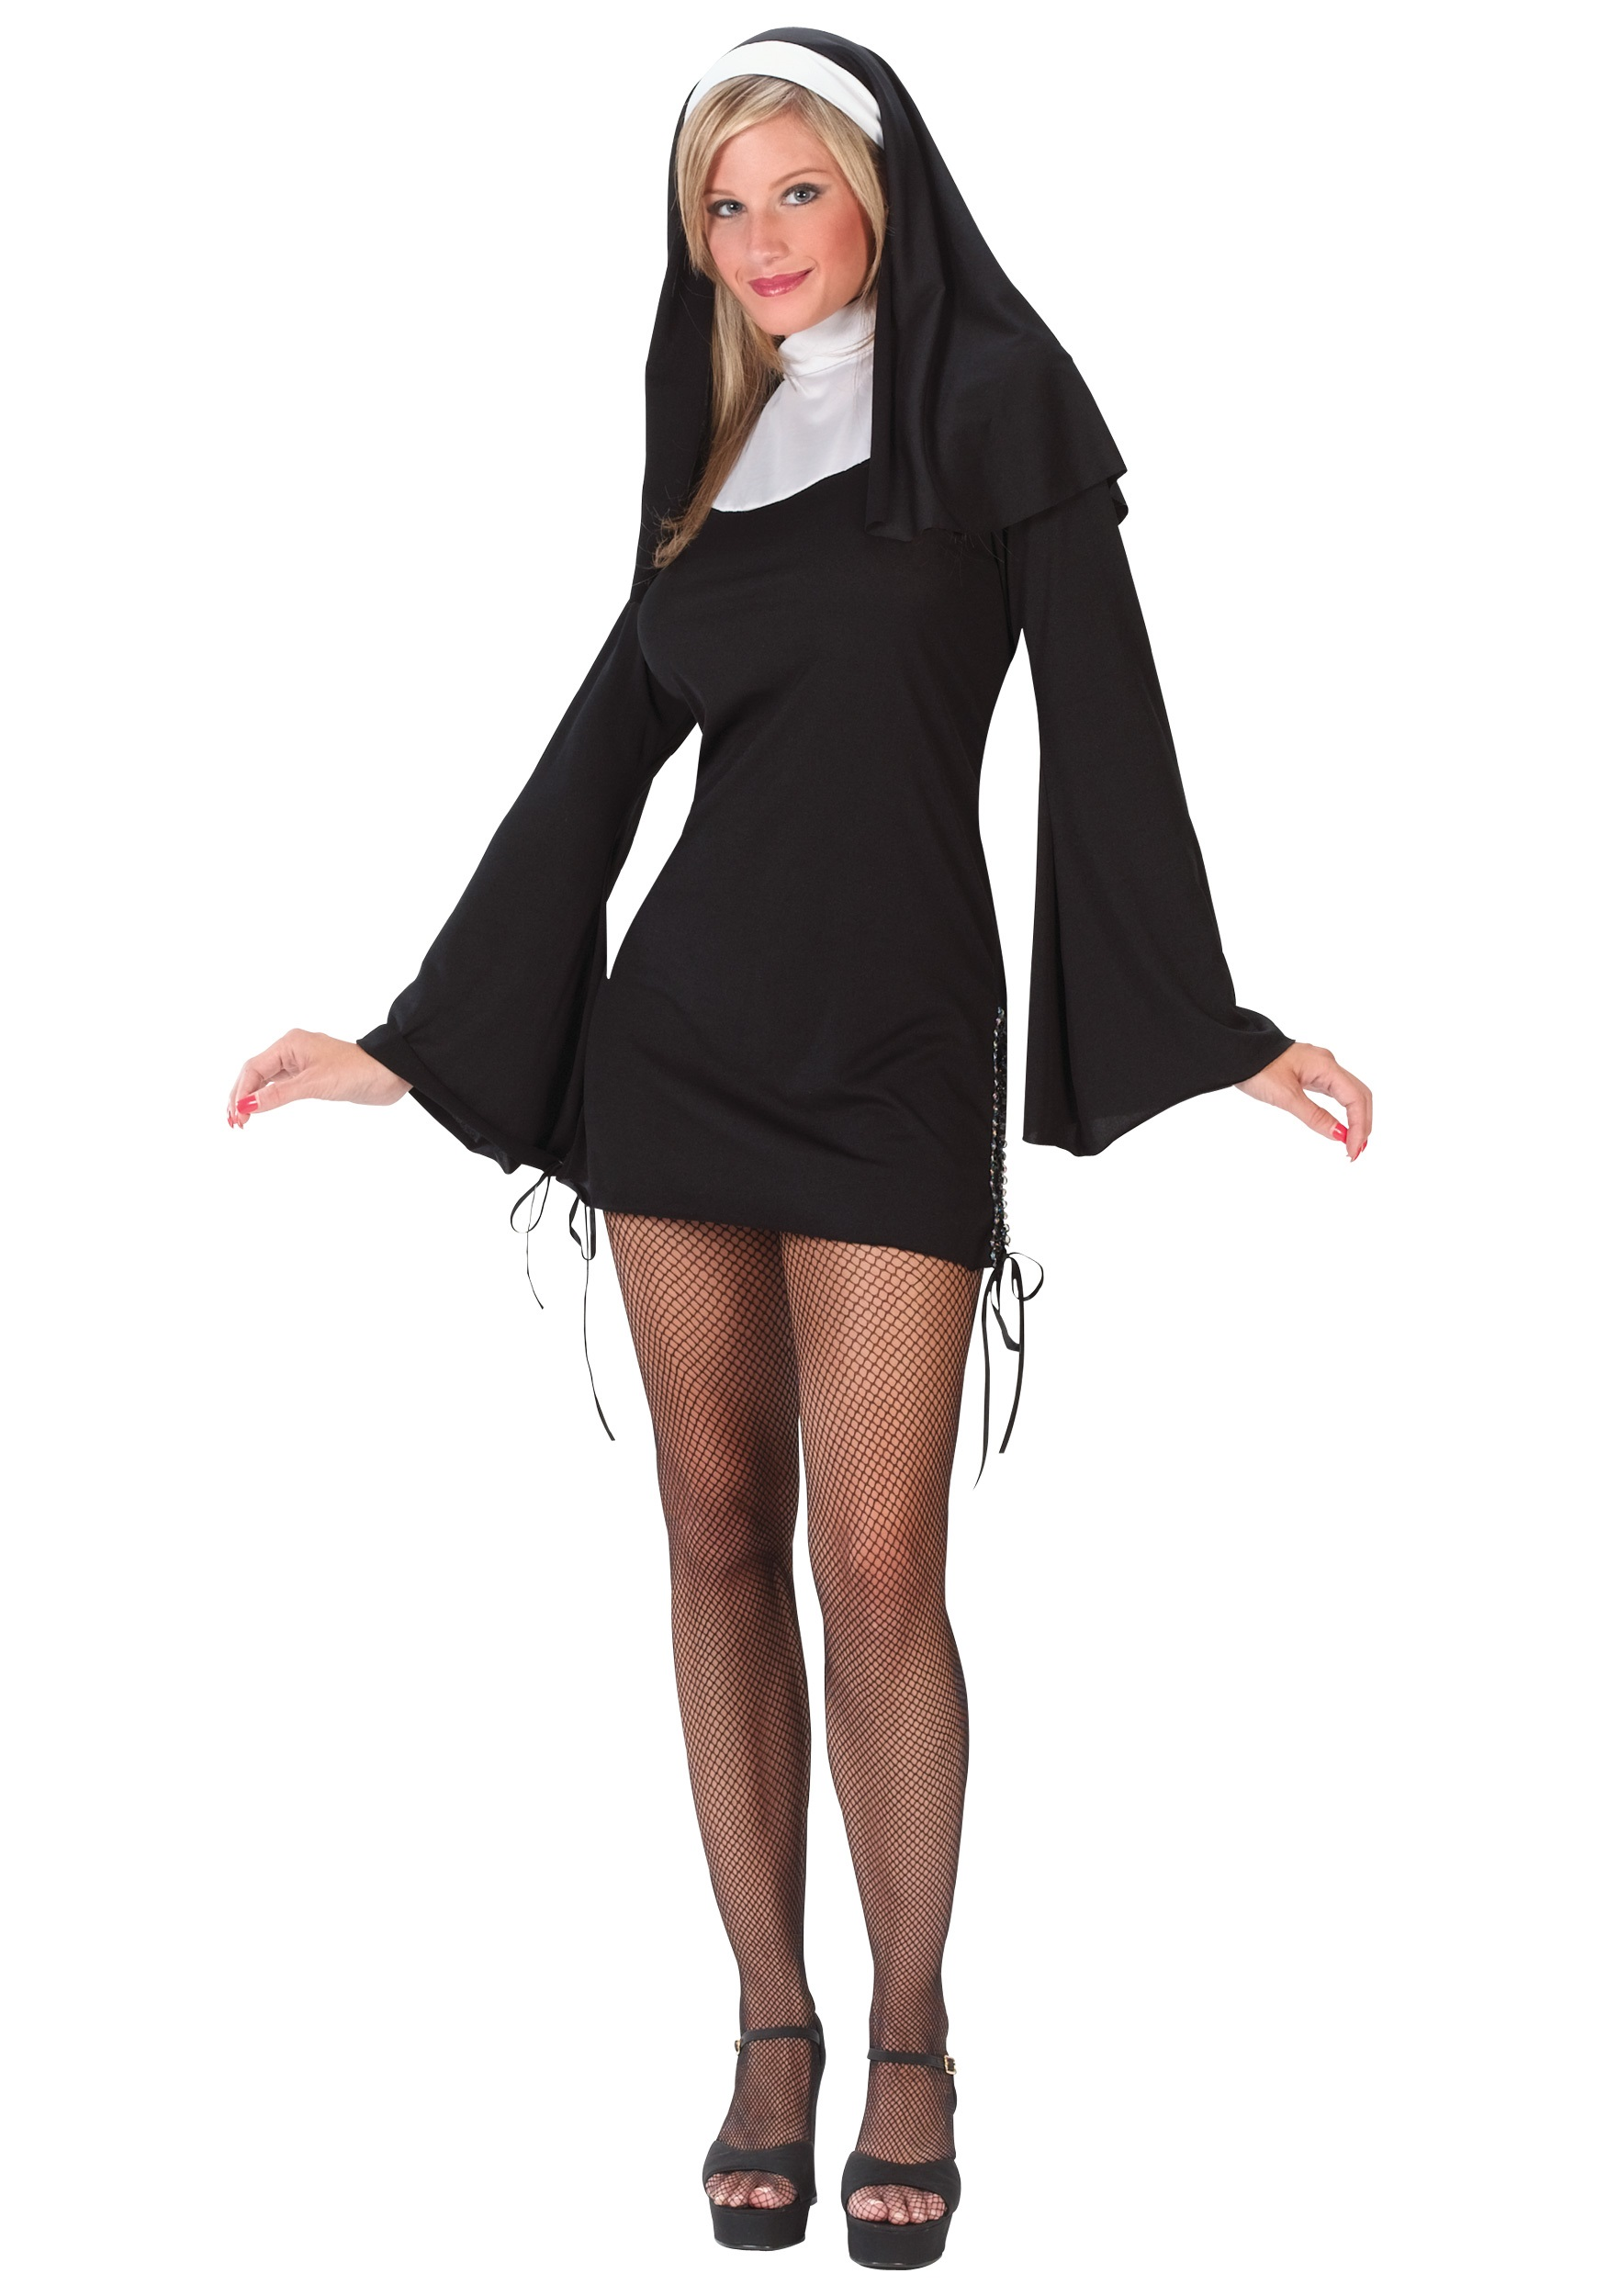 Naughty Nun Costume w/ Dress & Headpiece | Sexy Halloween Costume